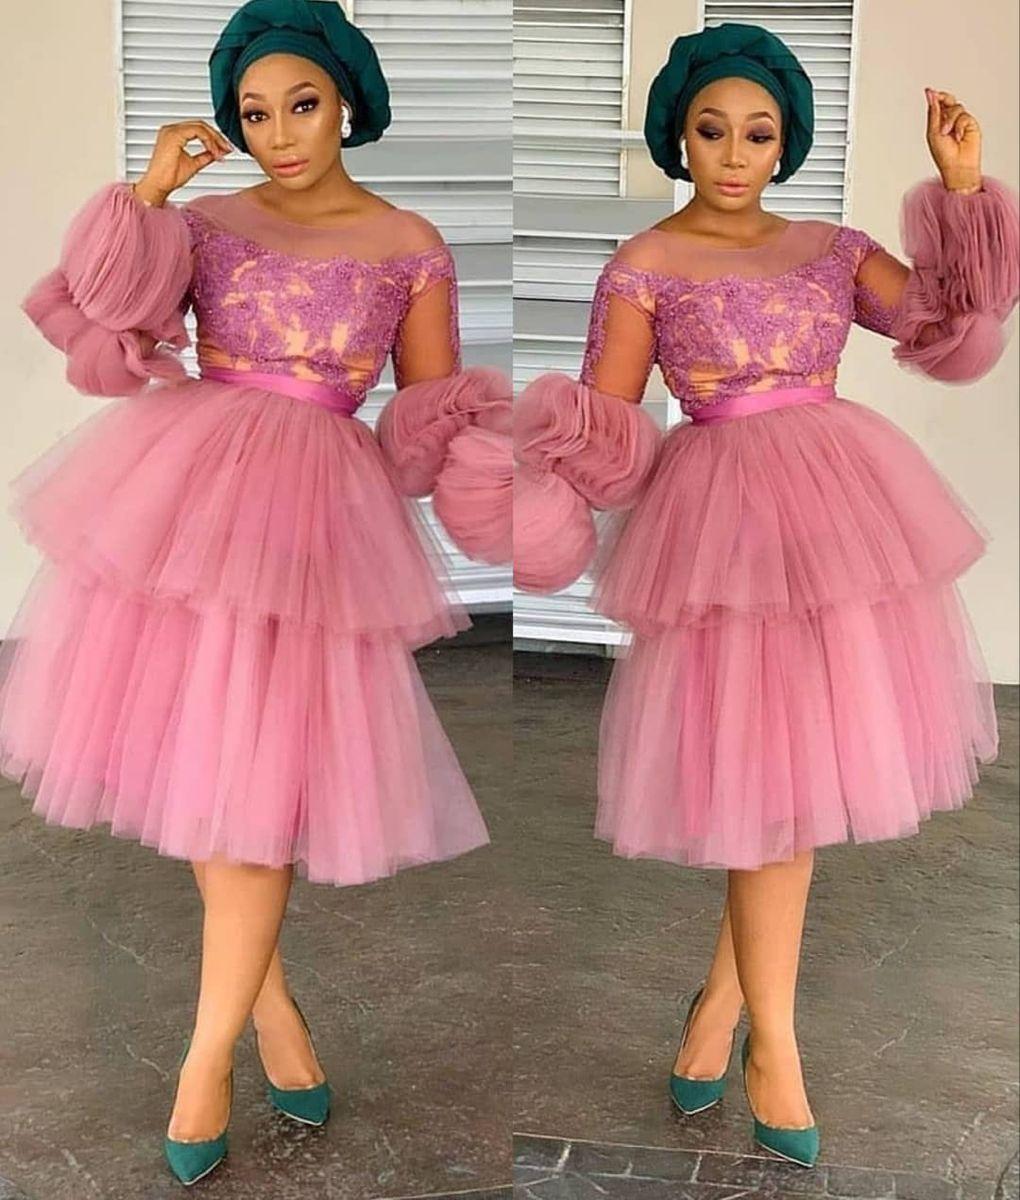 Ankara Midi Dress African Tulle Pink Dress African Tulle Ruffle Dress